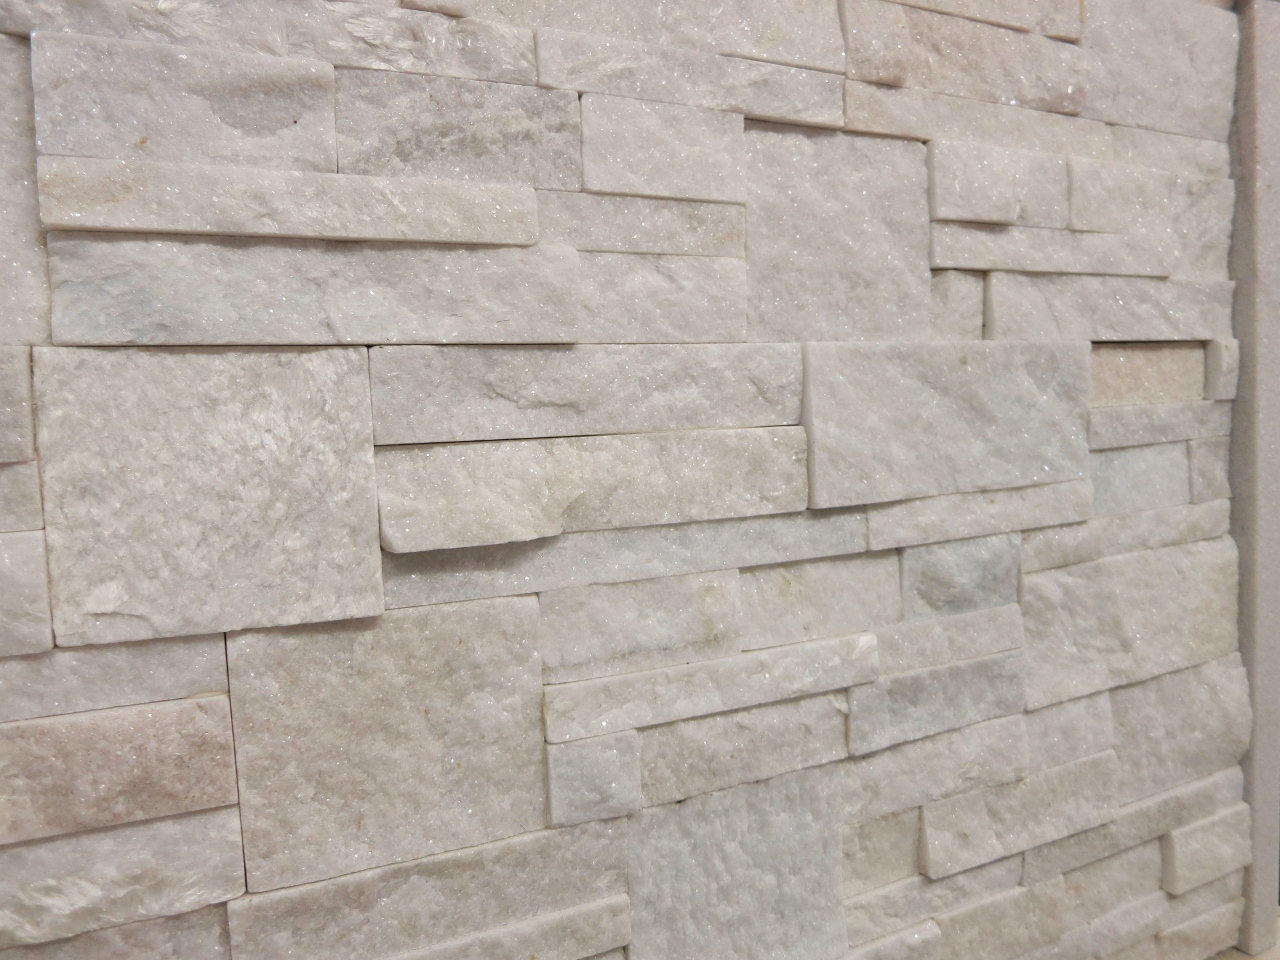 33. White Crystalized quartzite interlocking stacker